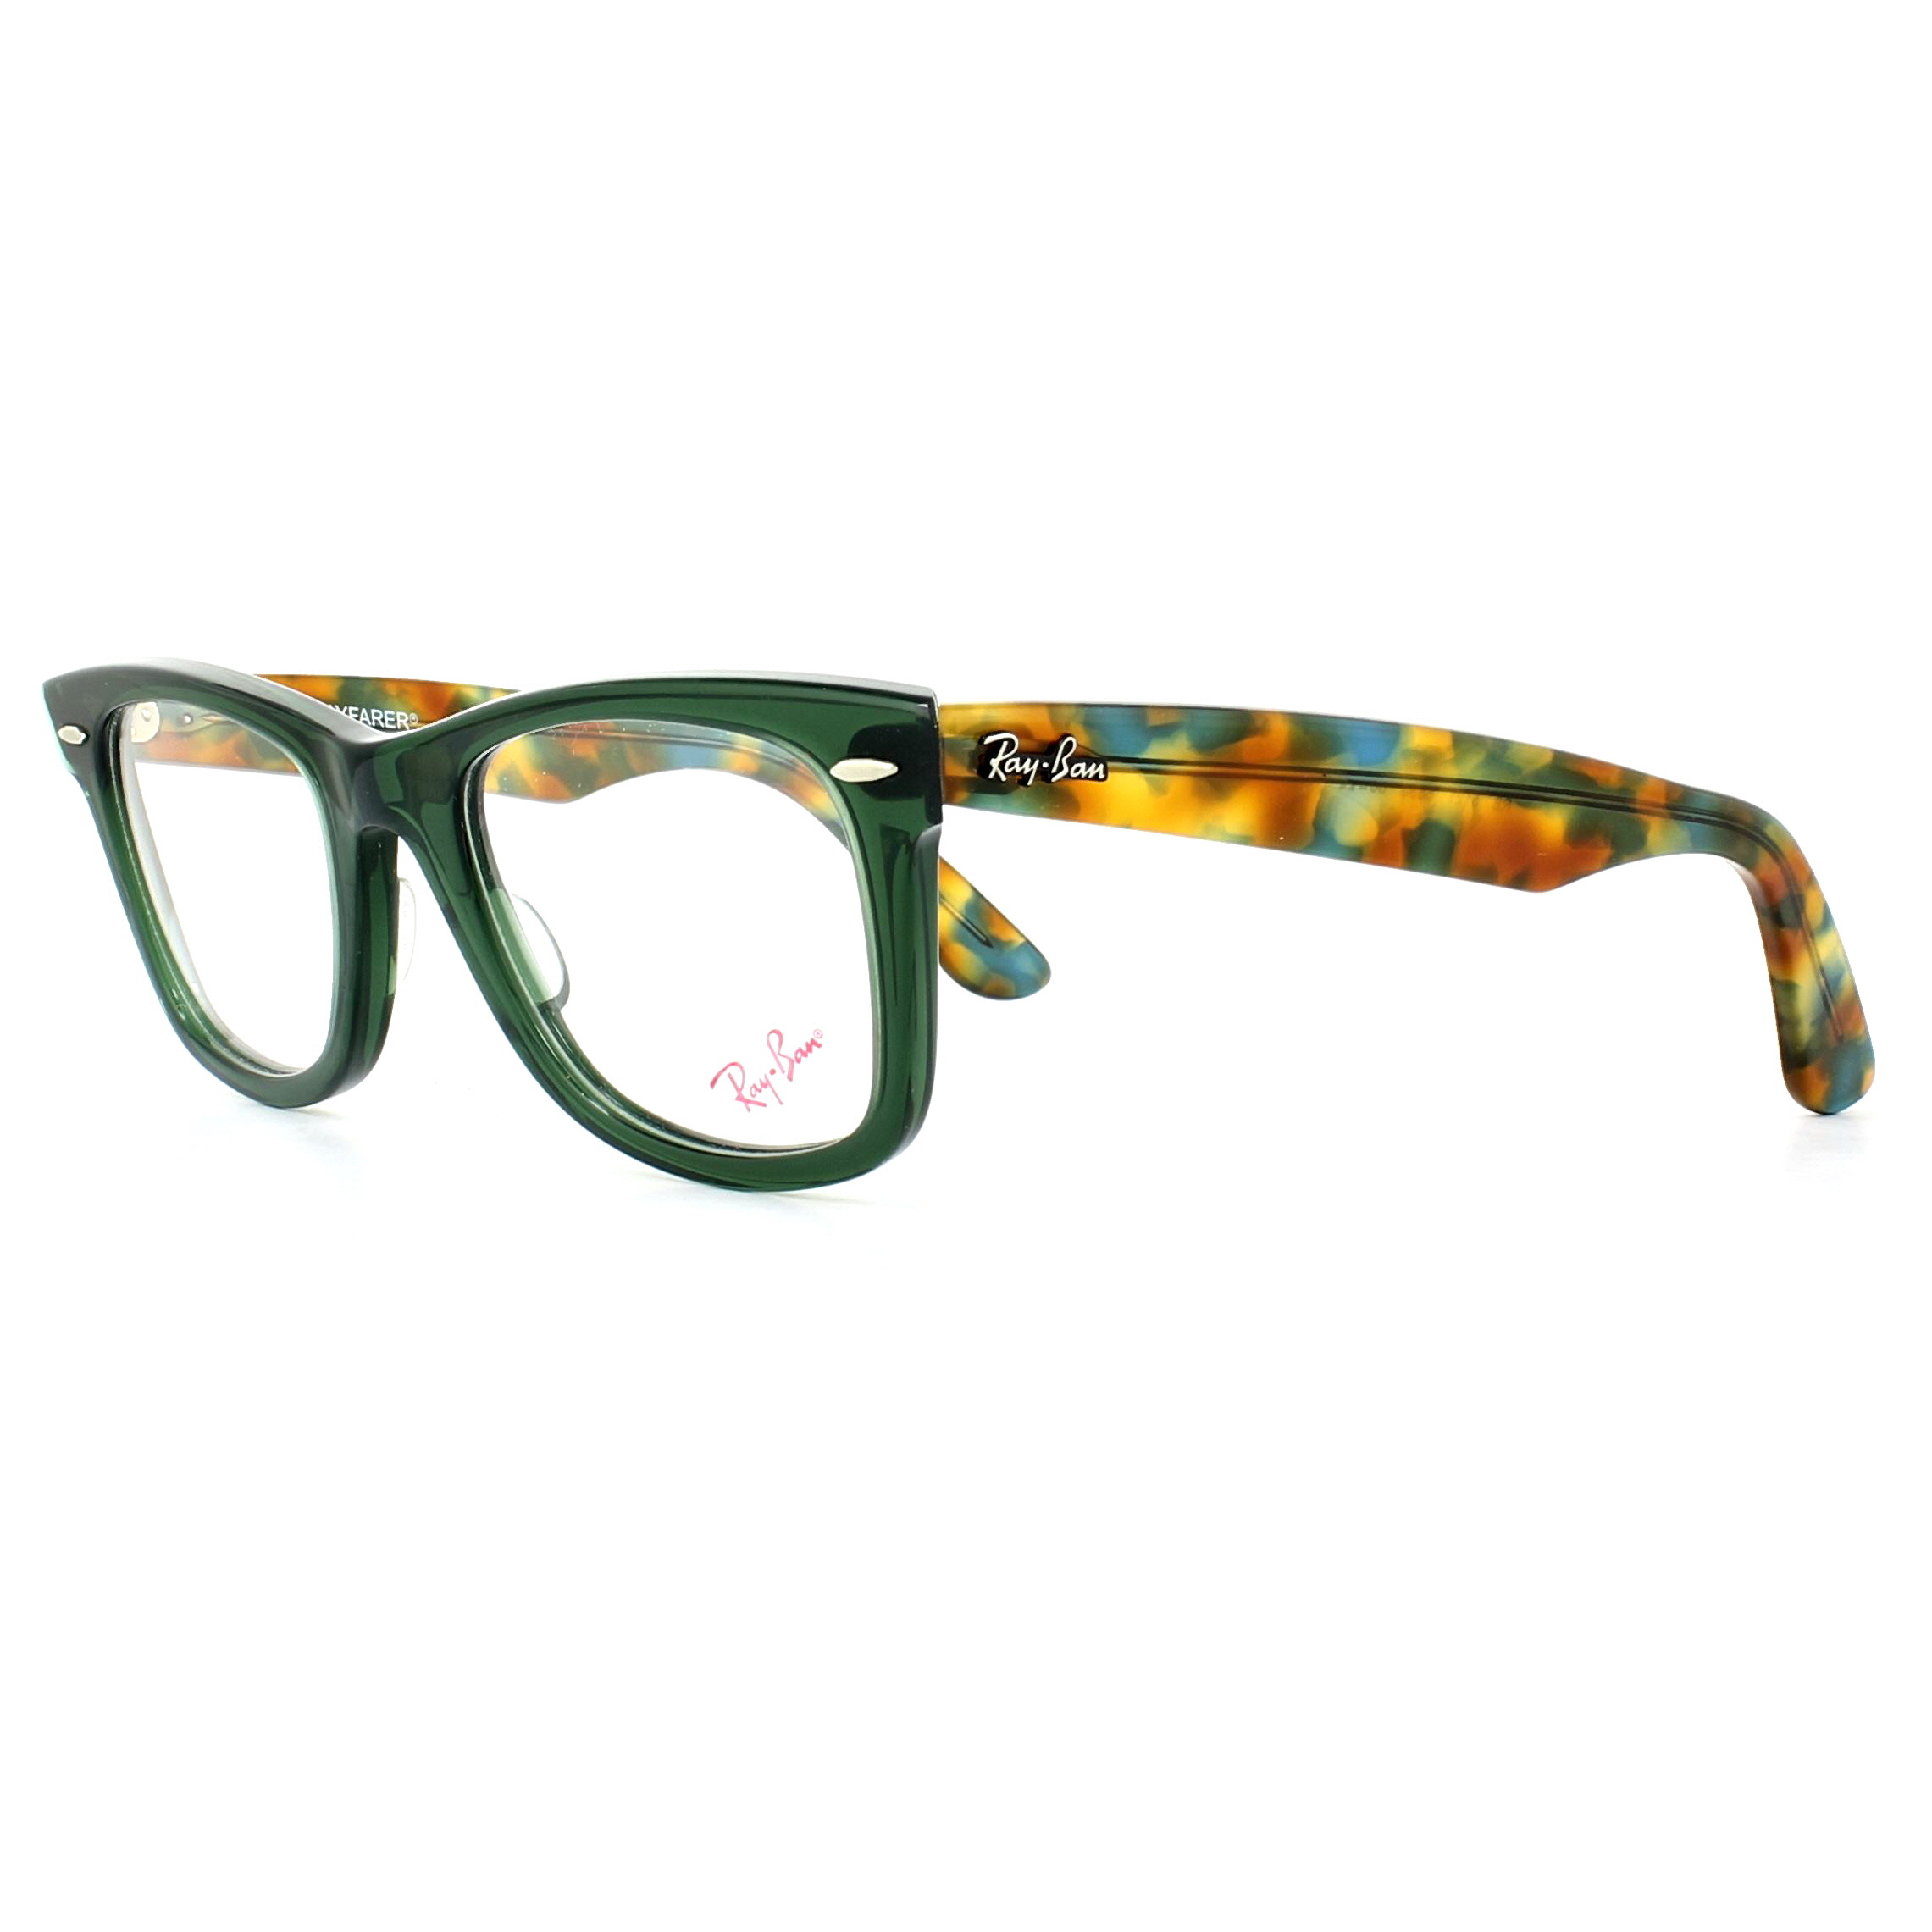 Ray-Ban Glasses Frames 5121 Original Wayfarer 5630 Opal Green ...